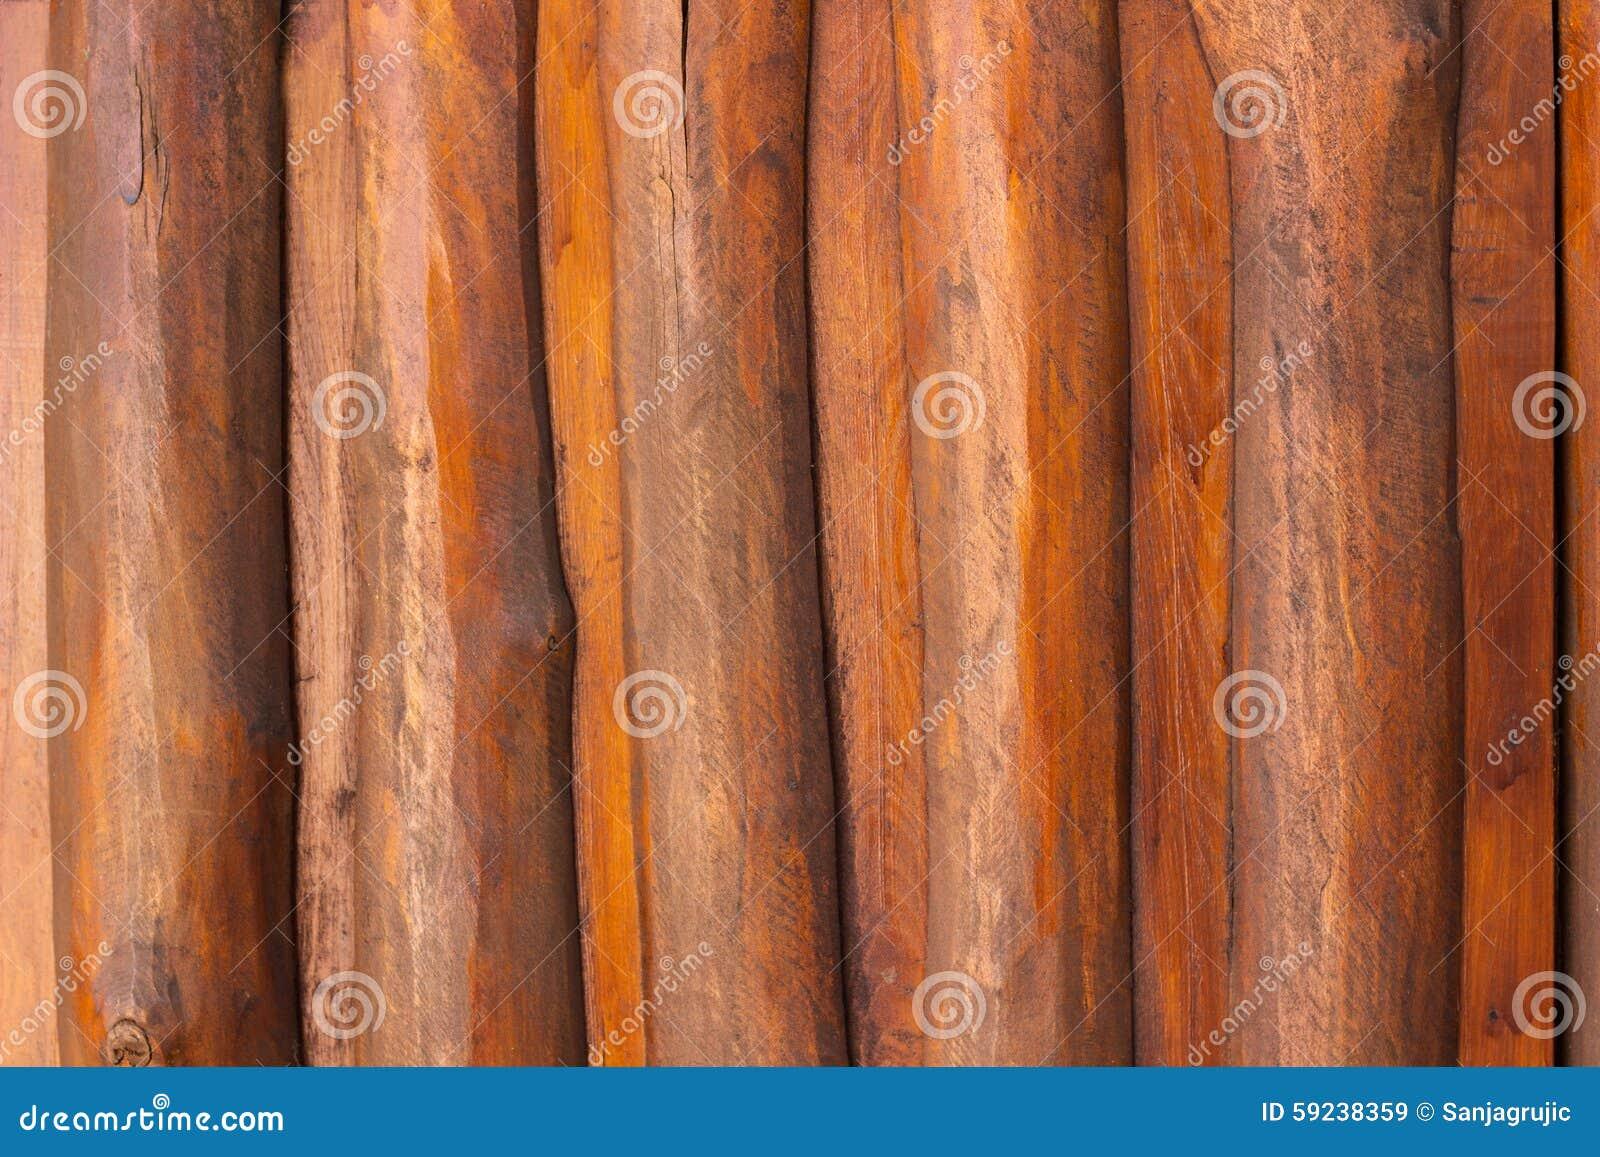 Download Textura de madera imagen de archivo. Imagen de cerca - 59238359